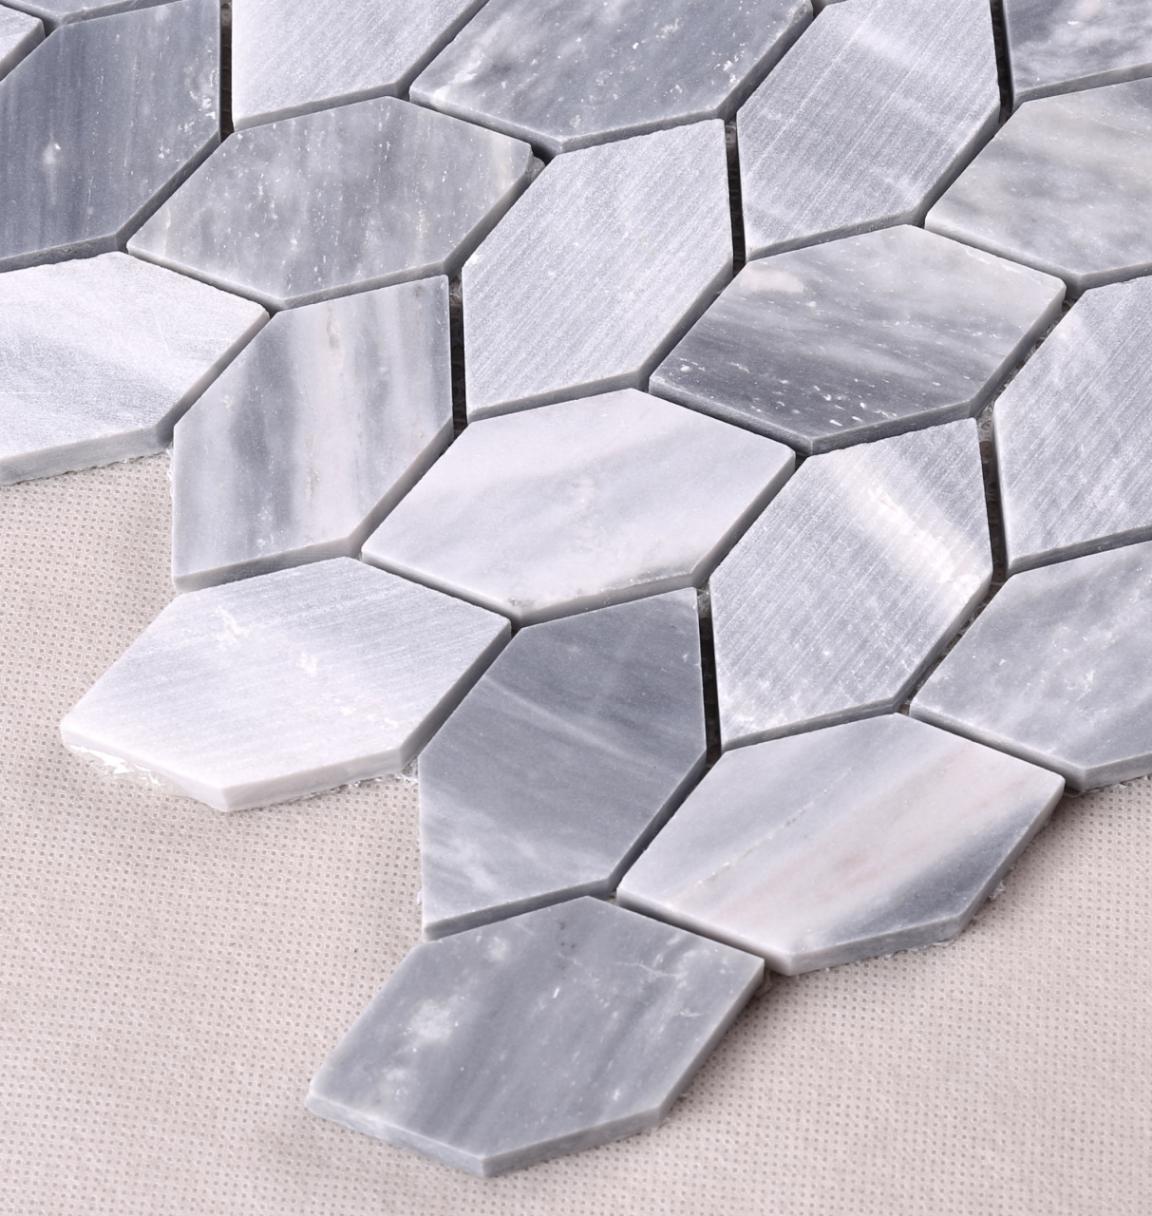 Heng Xing floor travertine stone inquire now for backsplash-2